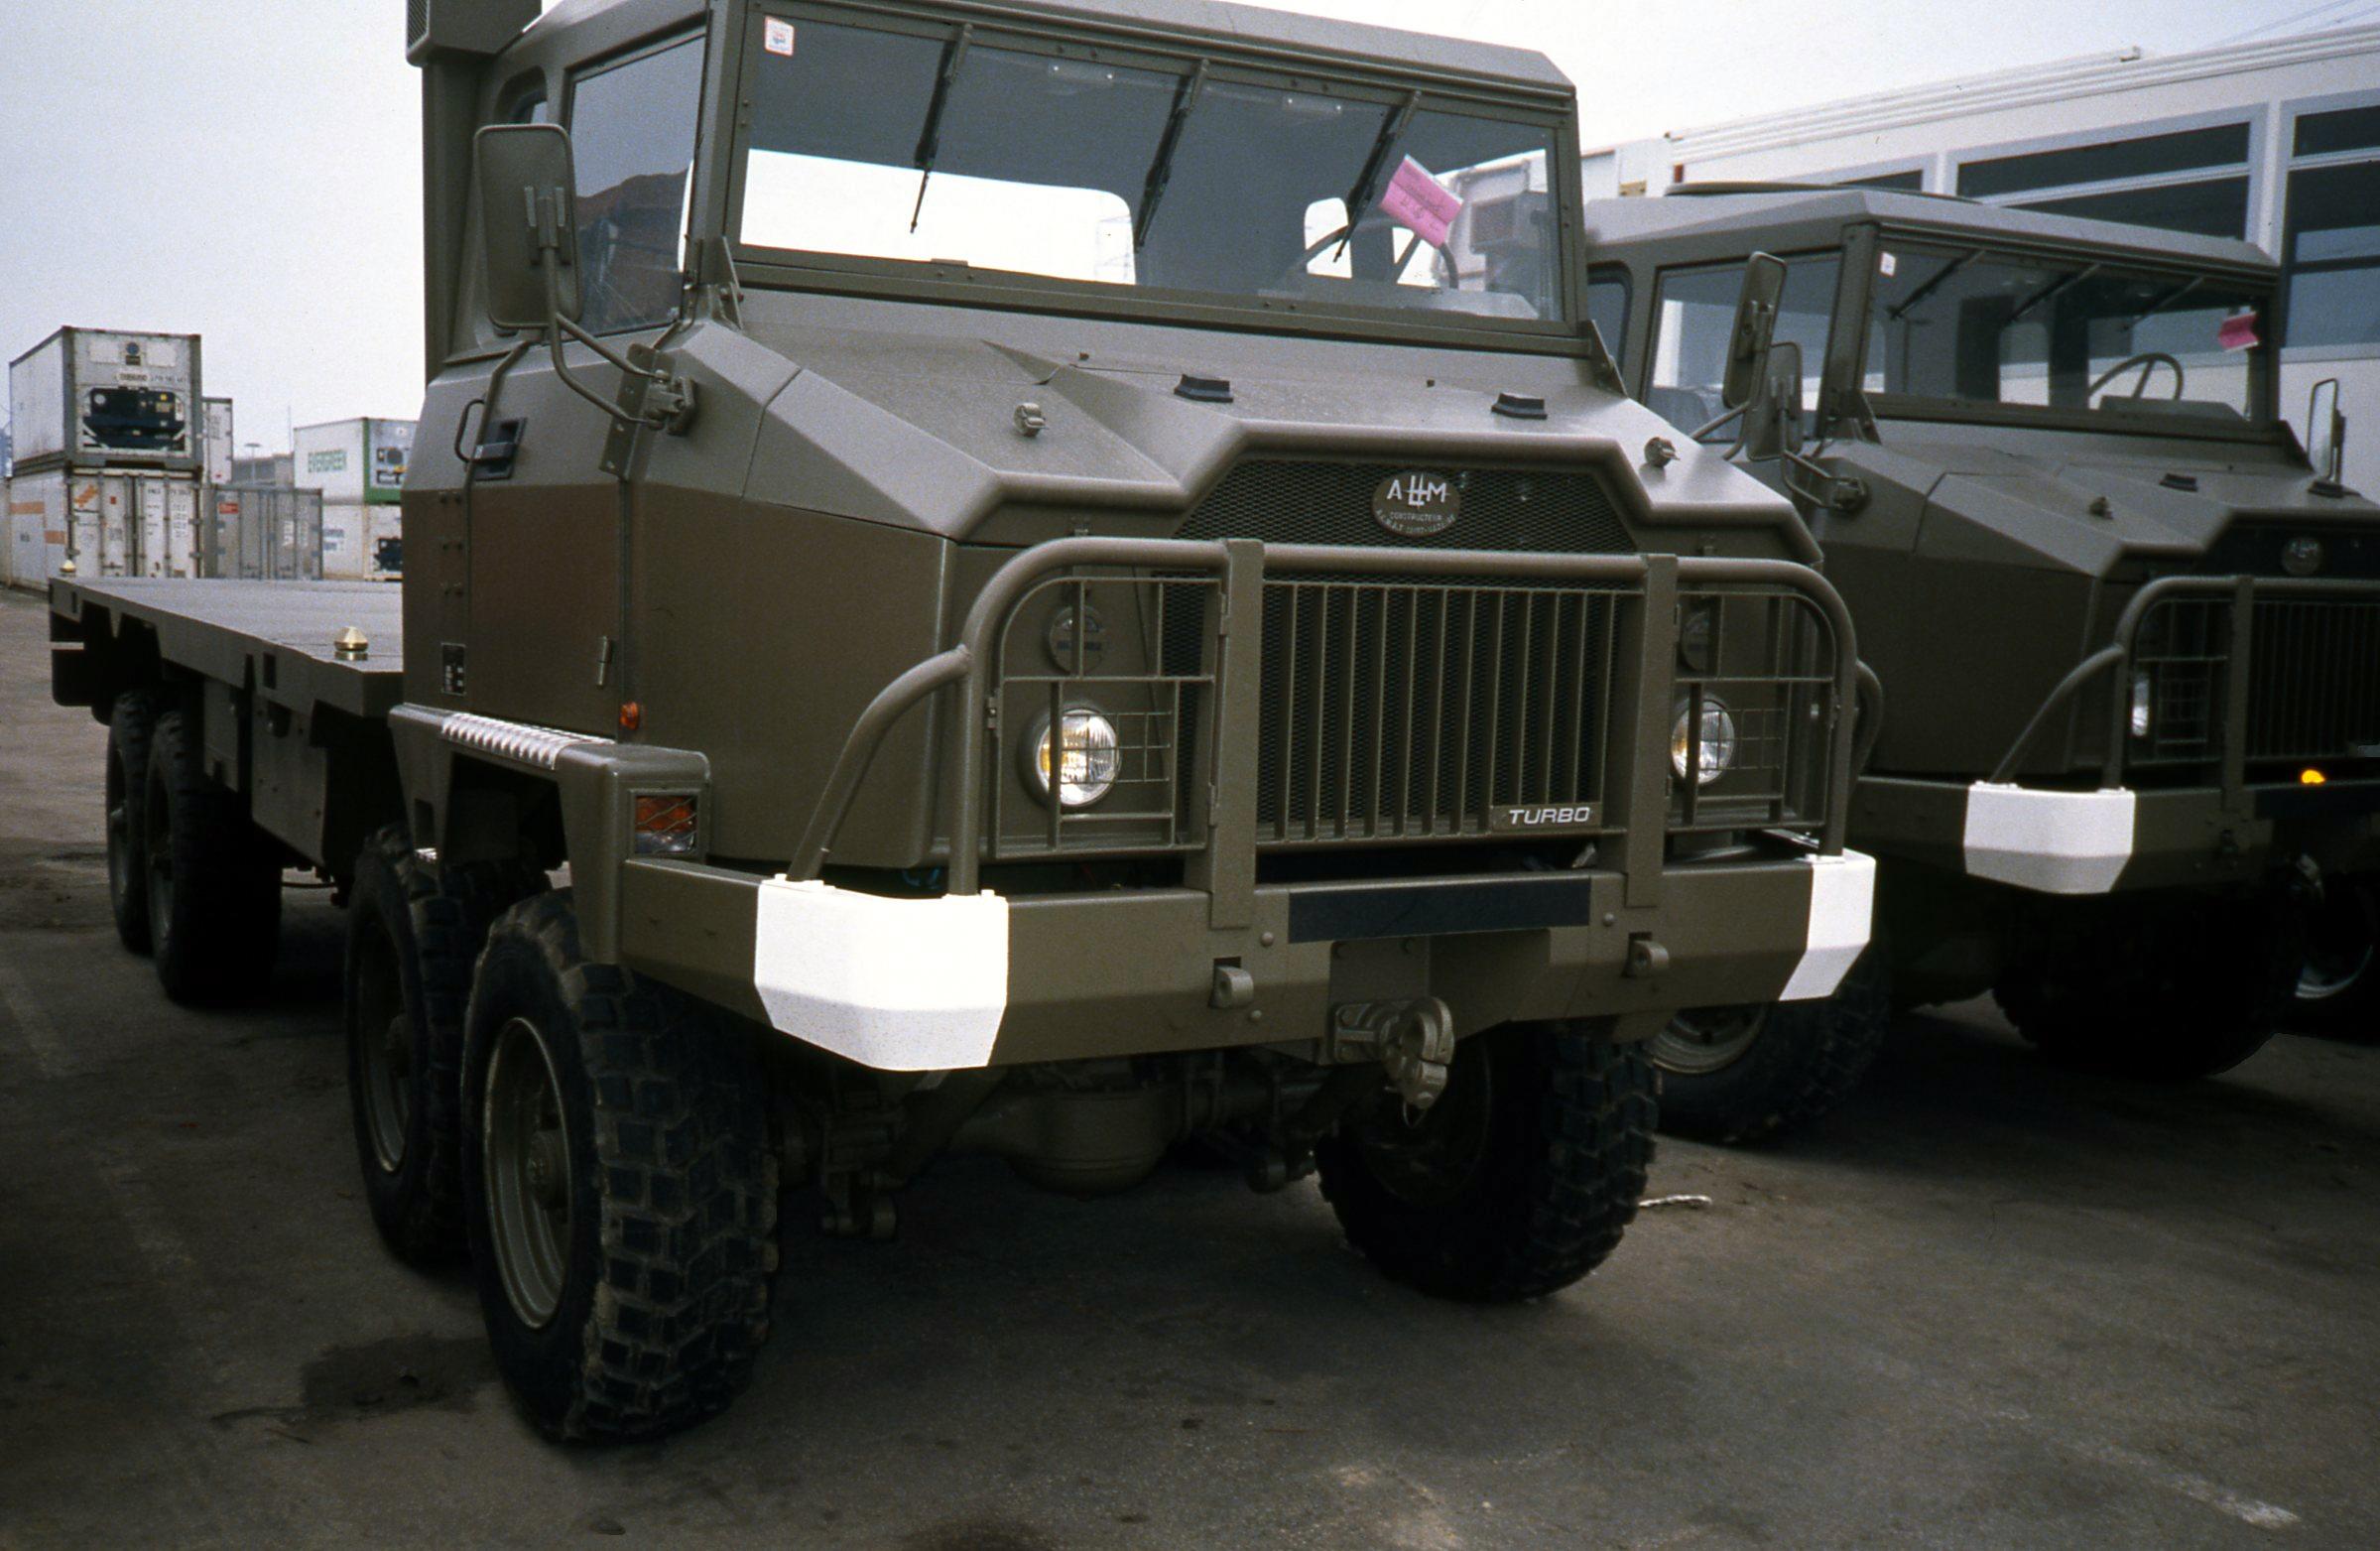 Photos - Logistique et Camions / Logistics and Trucks - Page 6 34775110661_213671de1f_o